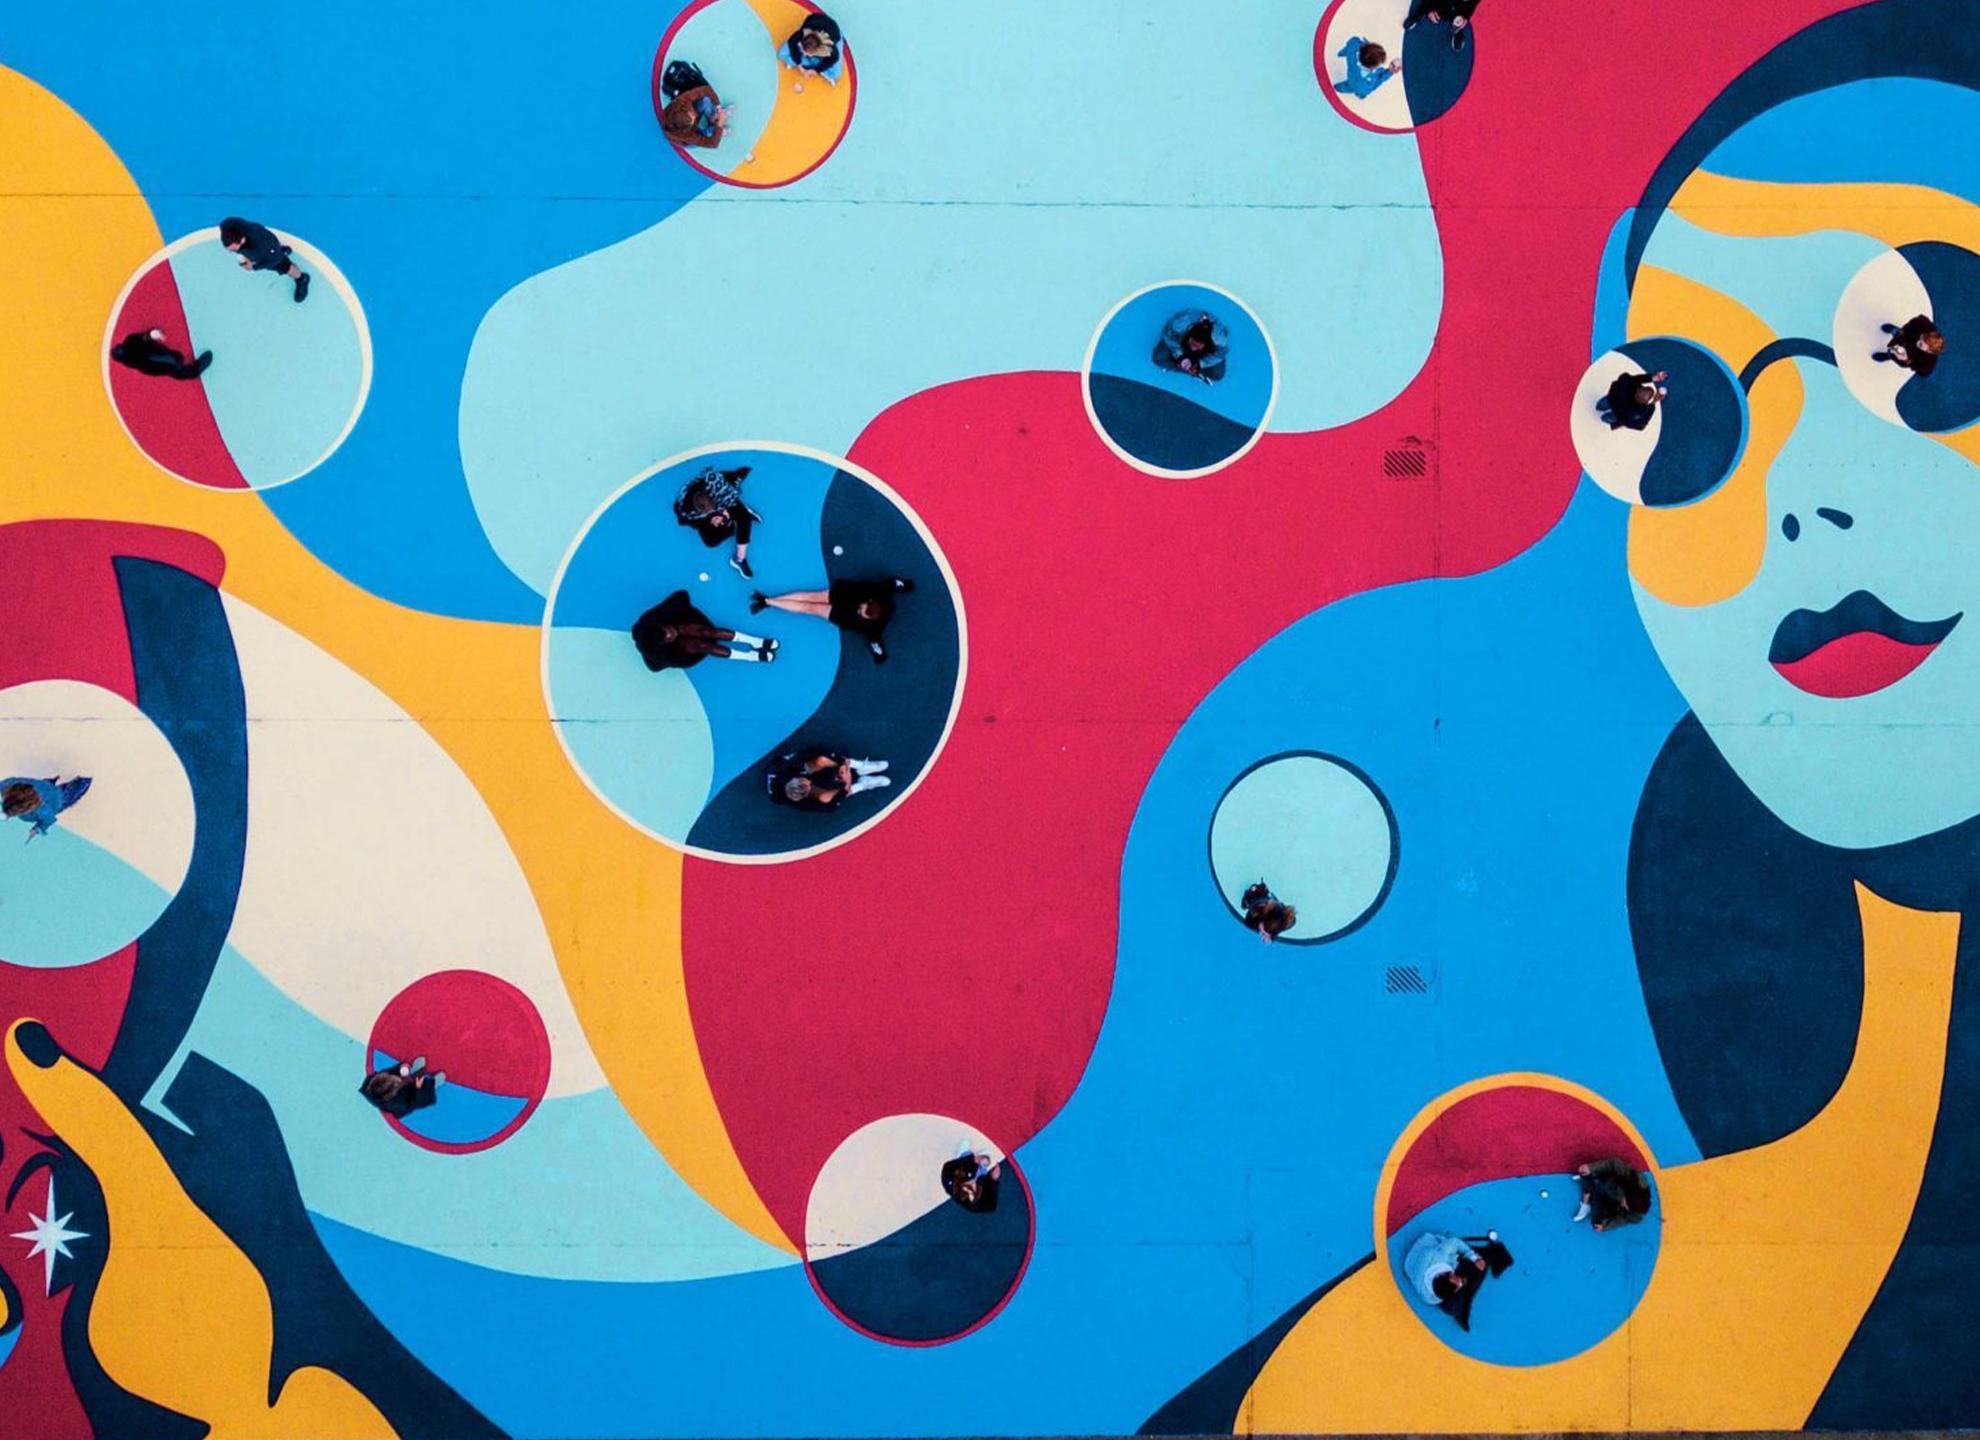 A Stella Artois street art marketing campaign by brand storytelling agency Mother